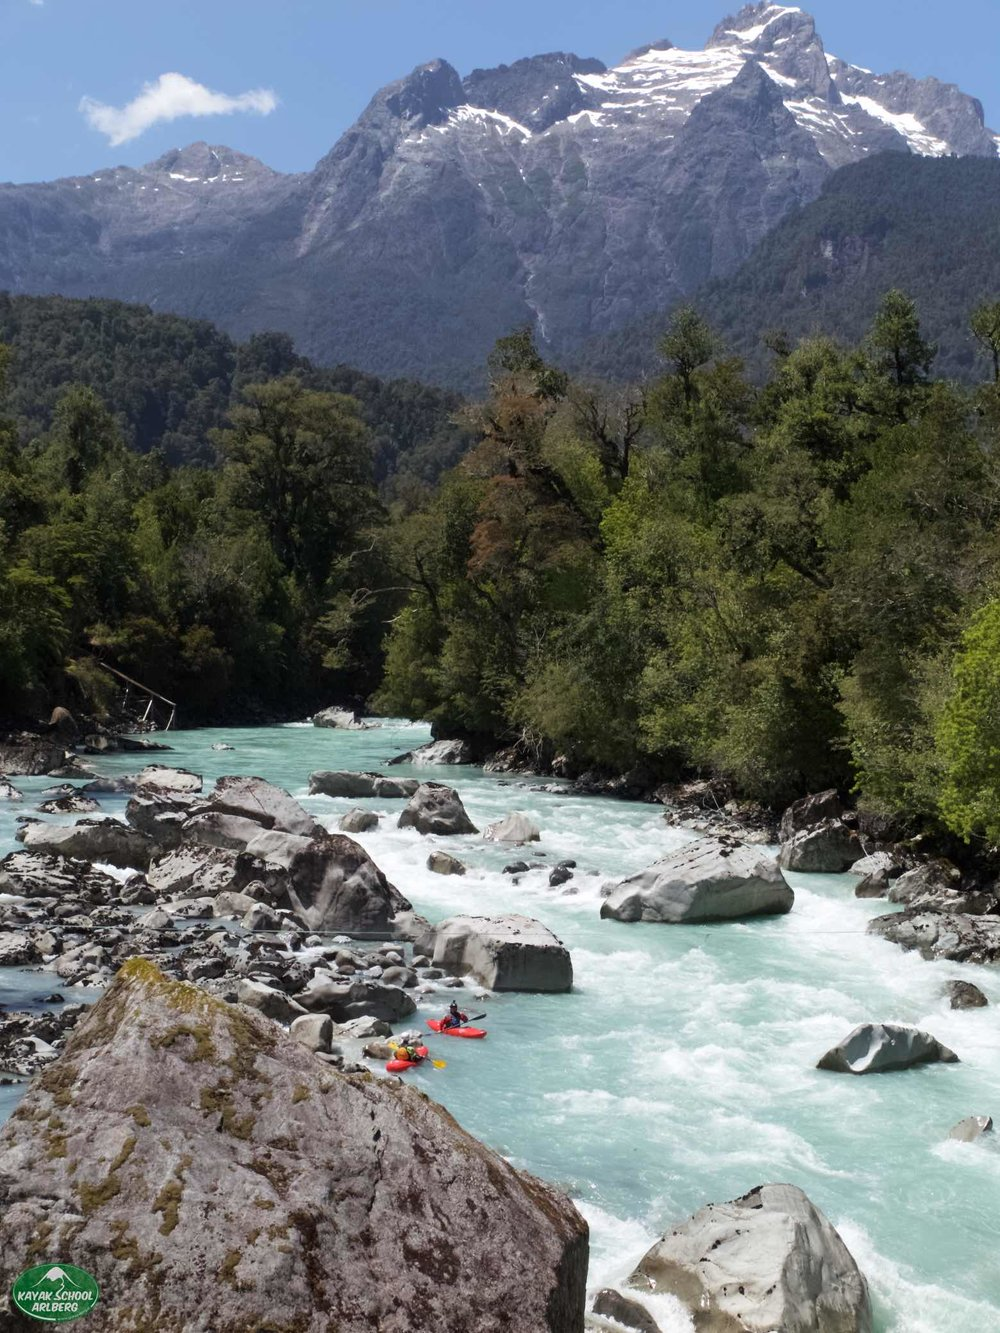 Kayak-Chile-Patagonia-Rio-Blanco-05.jpg